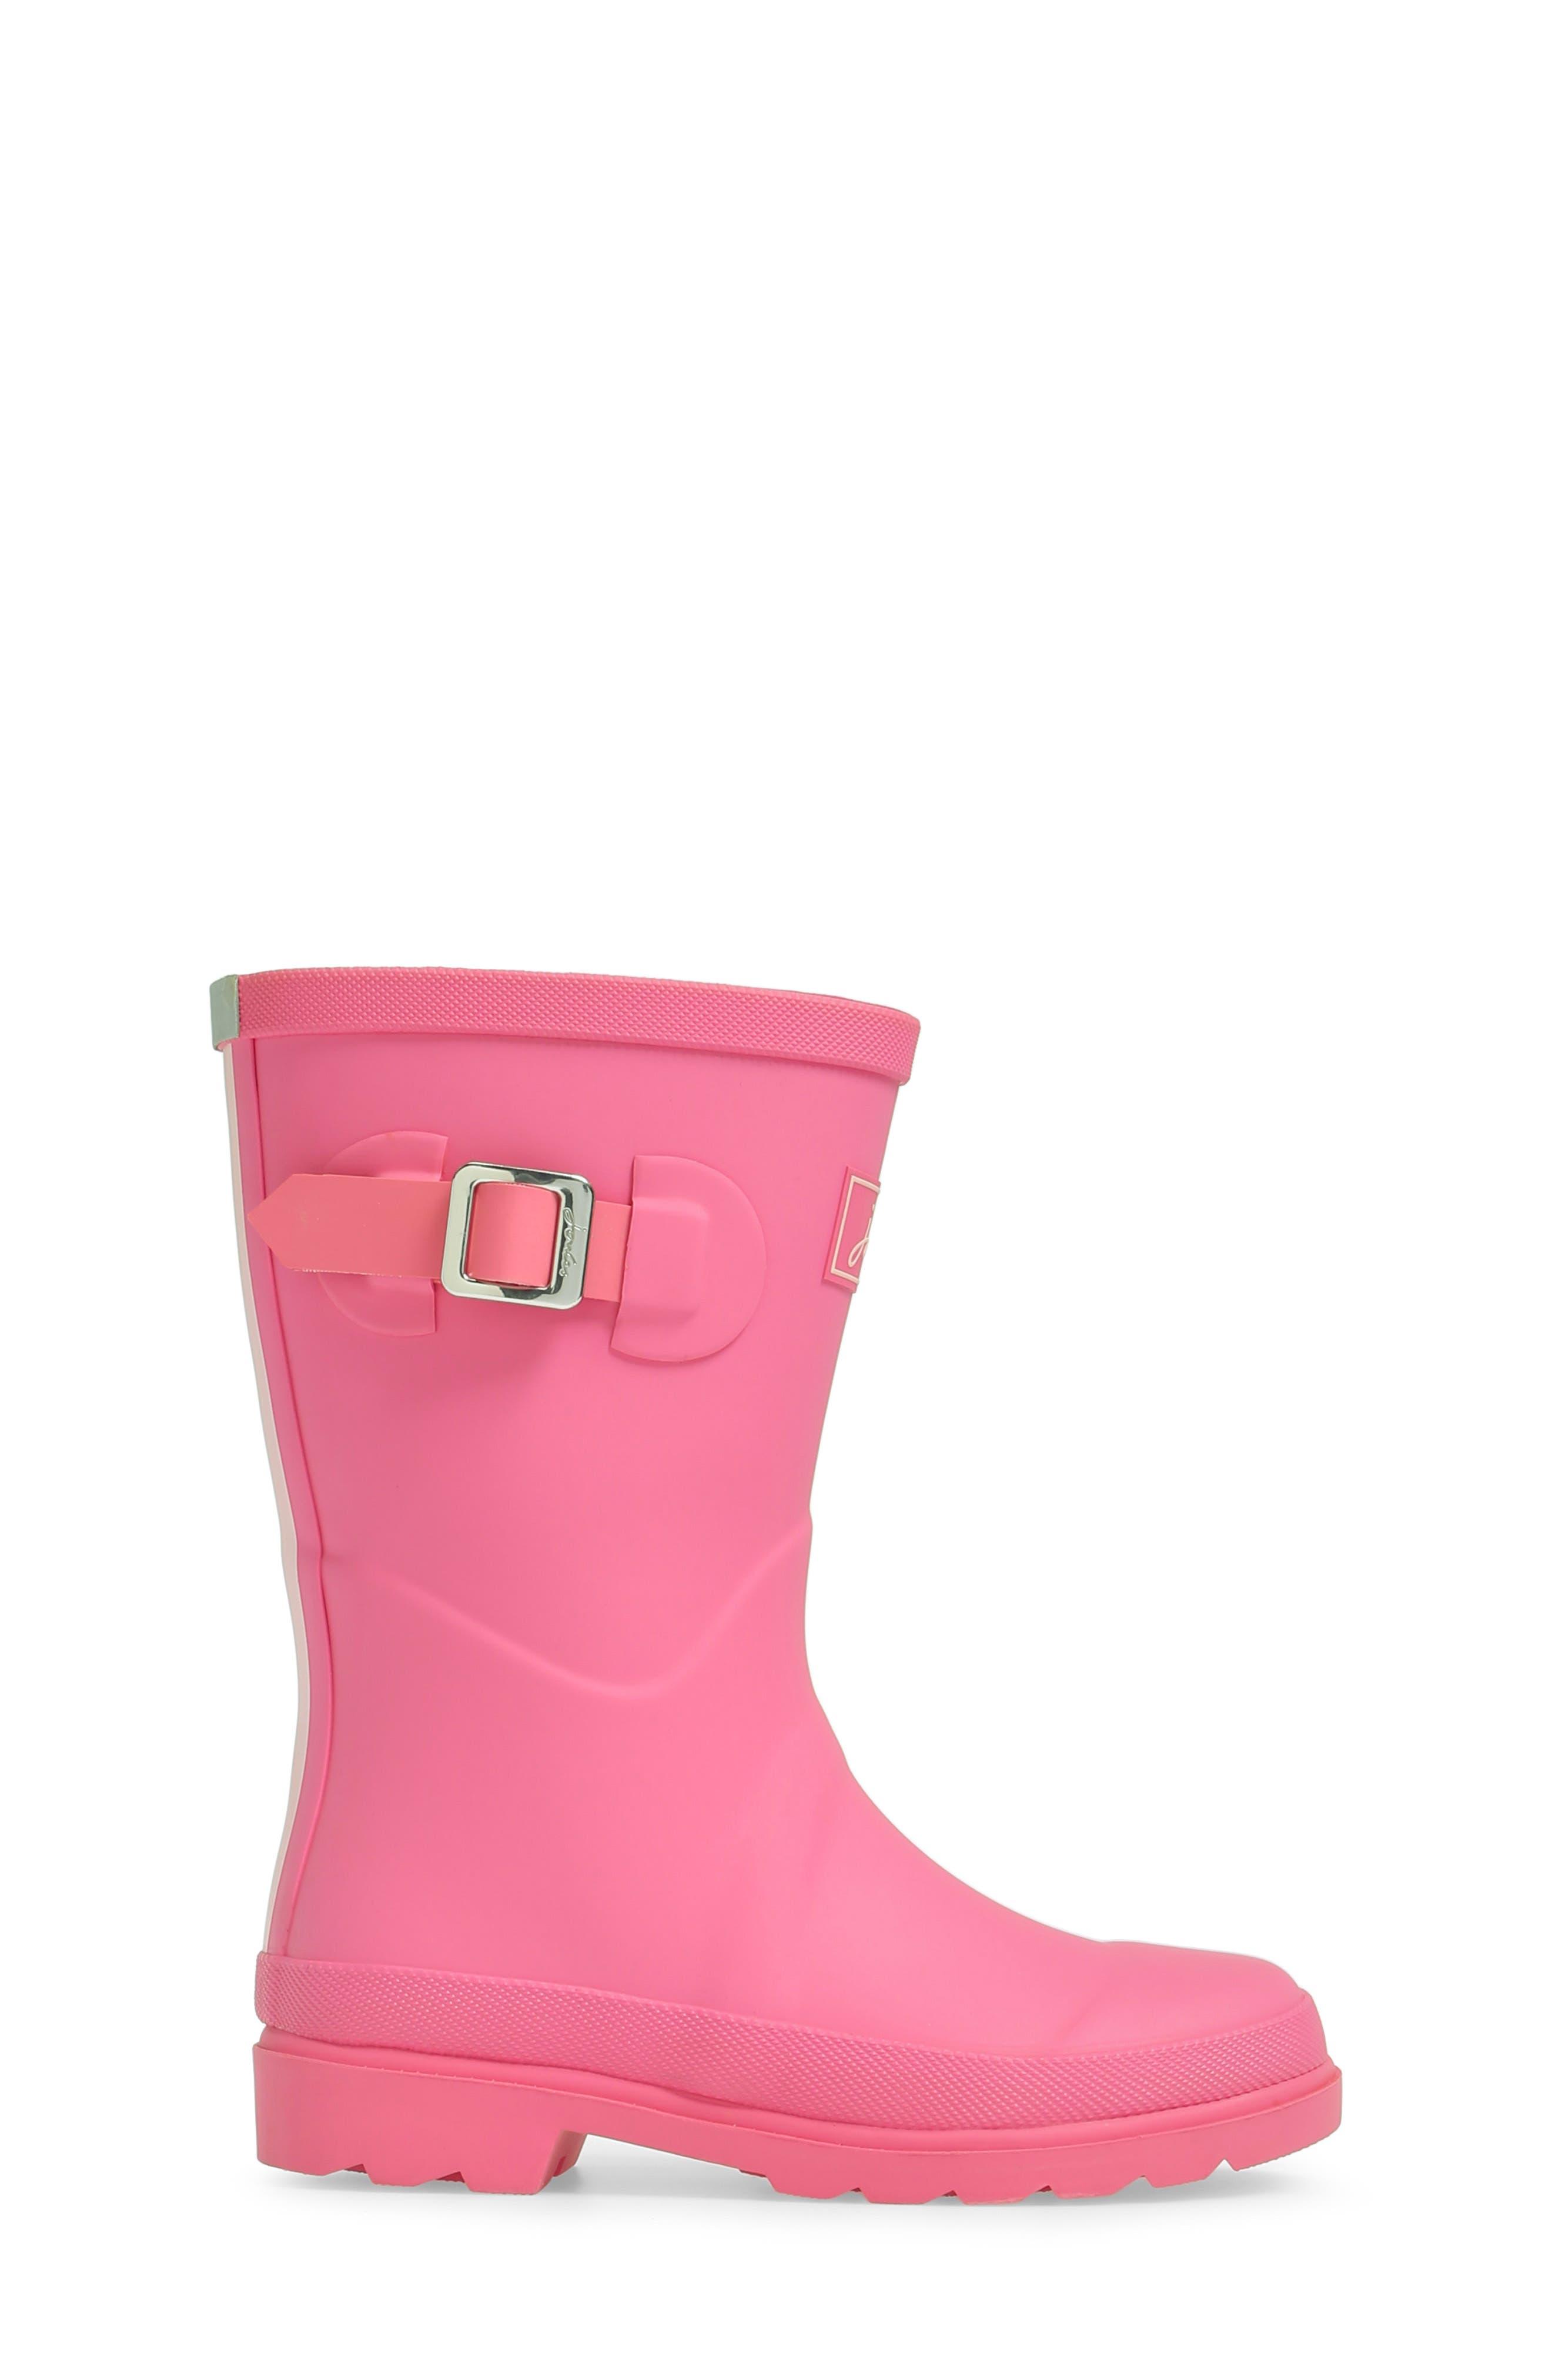 Alternate Image 3  - Joules Welly Matte Waterproof Rain Boot (Toddler, Little Kid & Big Kid)